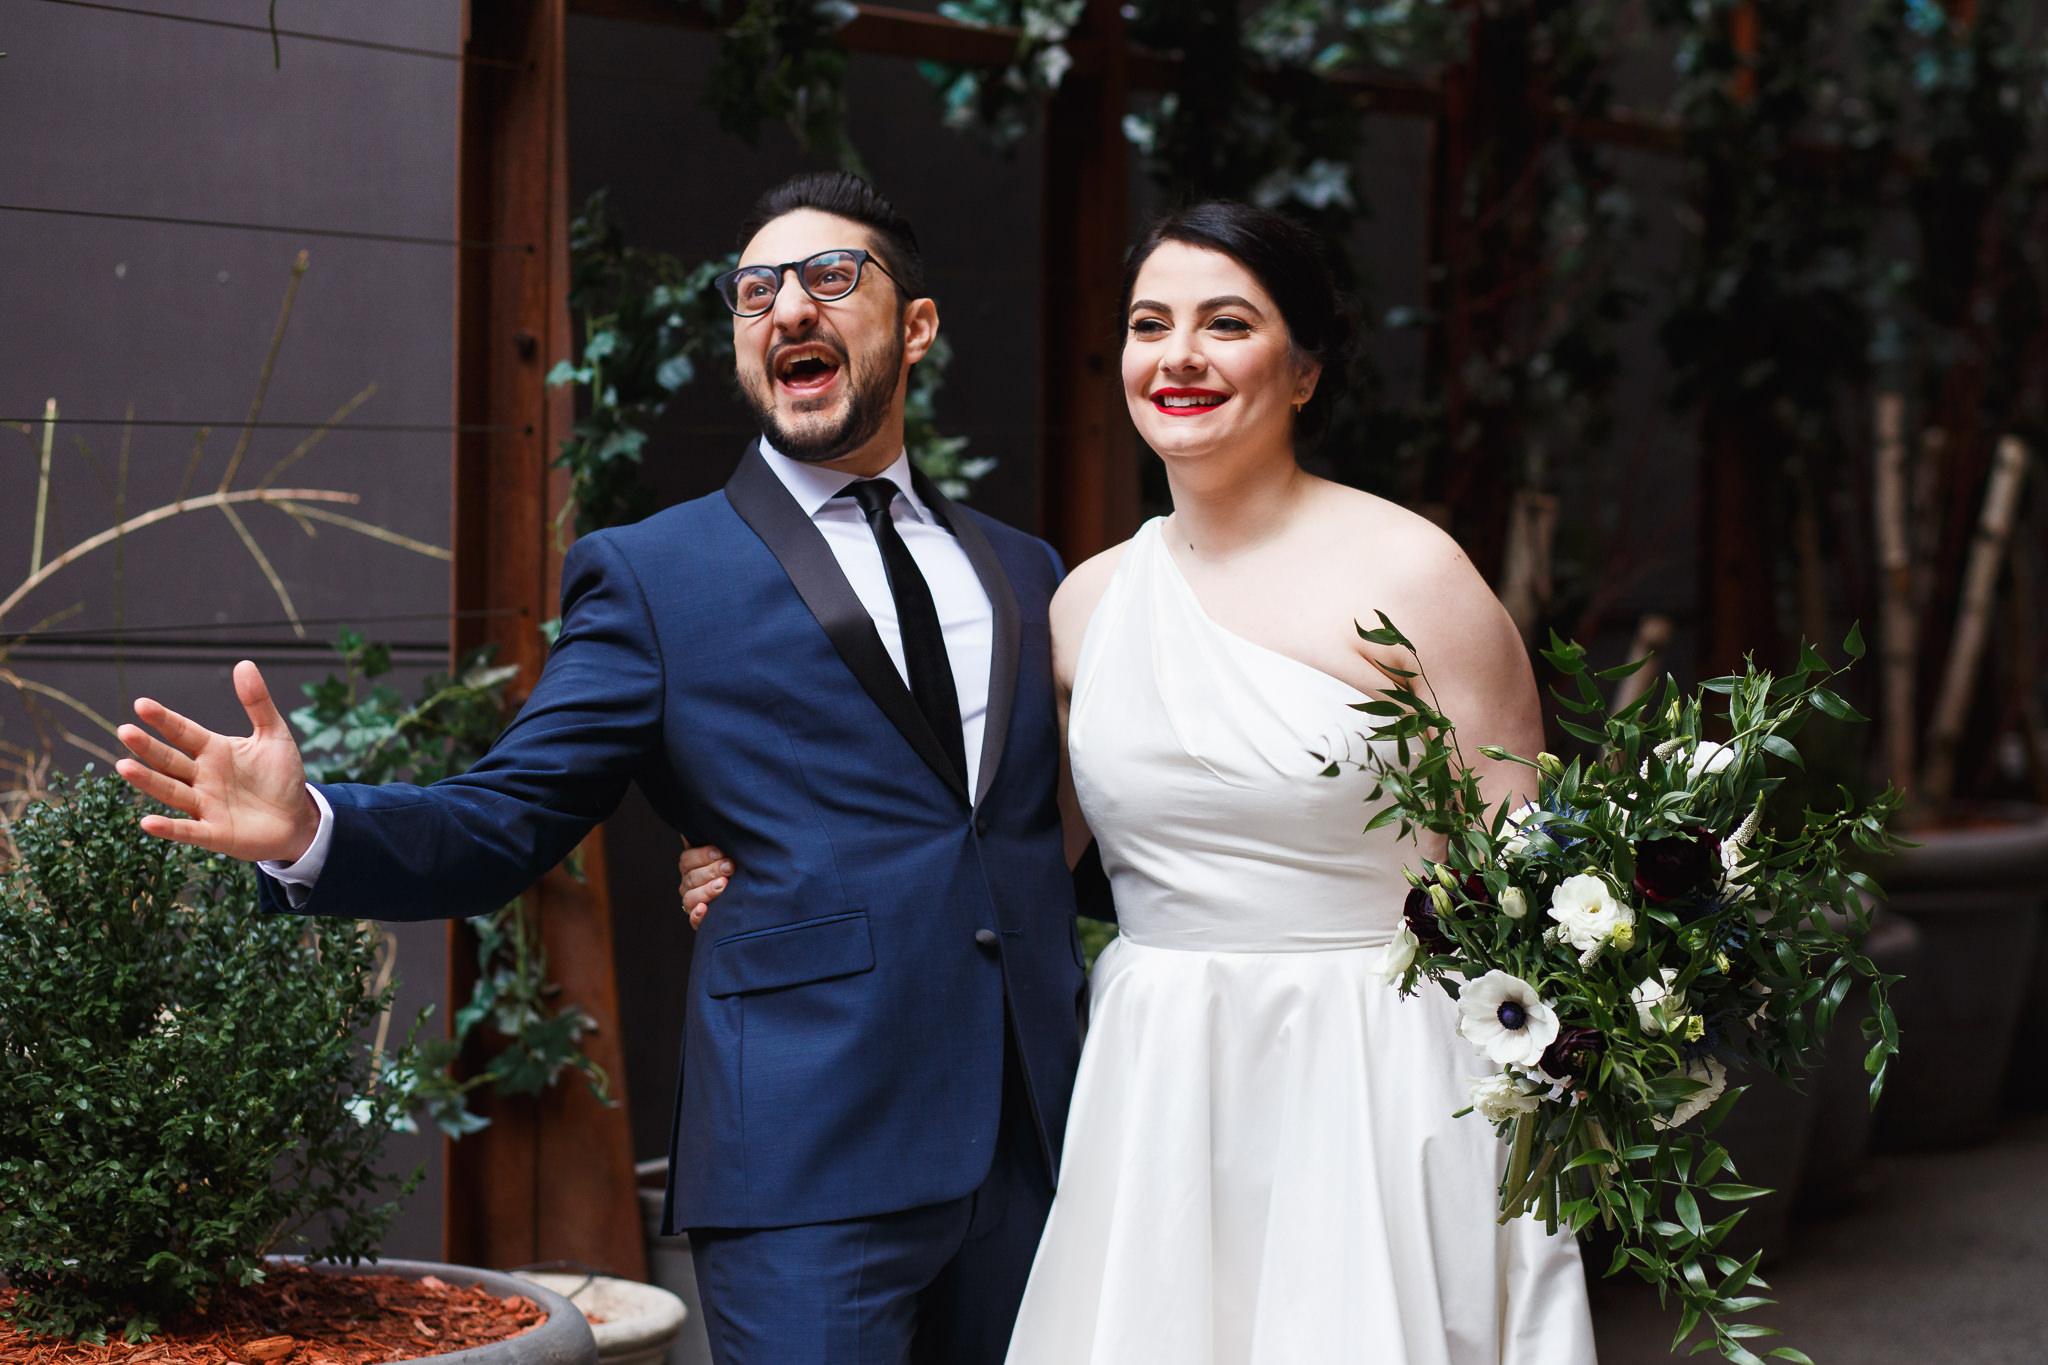 new-york-city-wedding-photographer-housing-works-wedding-soho-wedding-nomo-soho-Brooklyn-wedding-photographer-